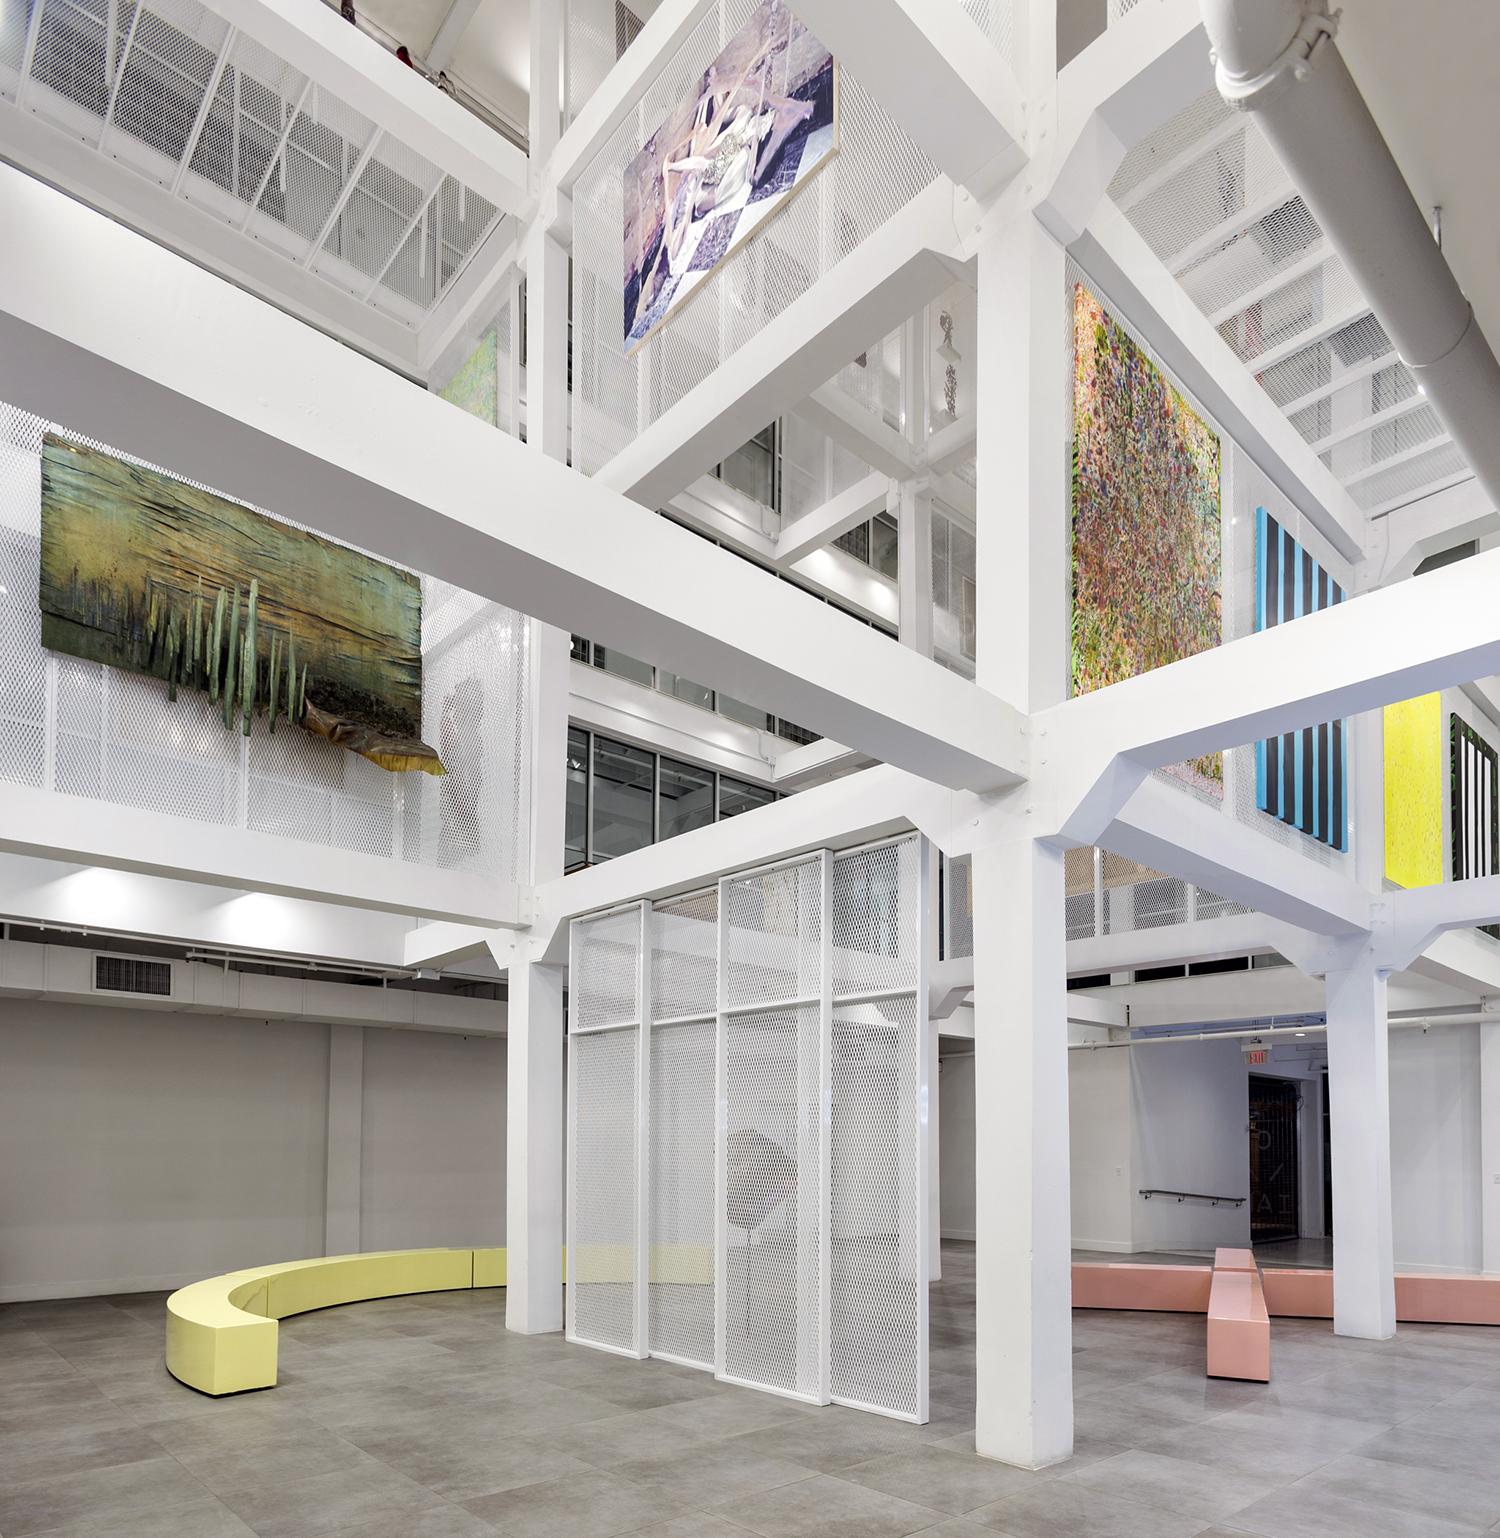 GucciVuitton , Institute of Contemporary Art, Miami, 2015